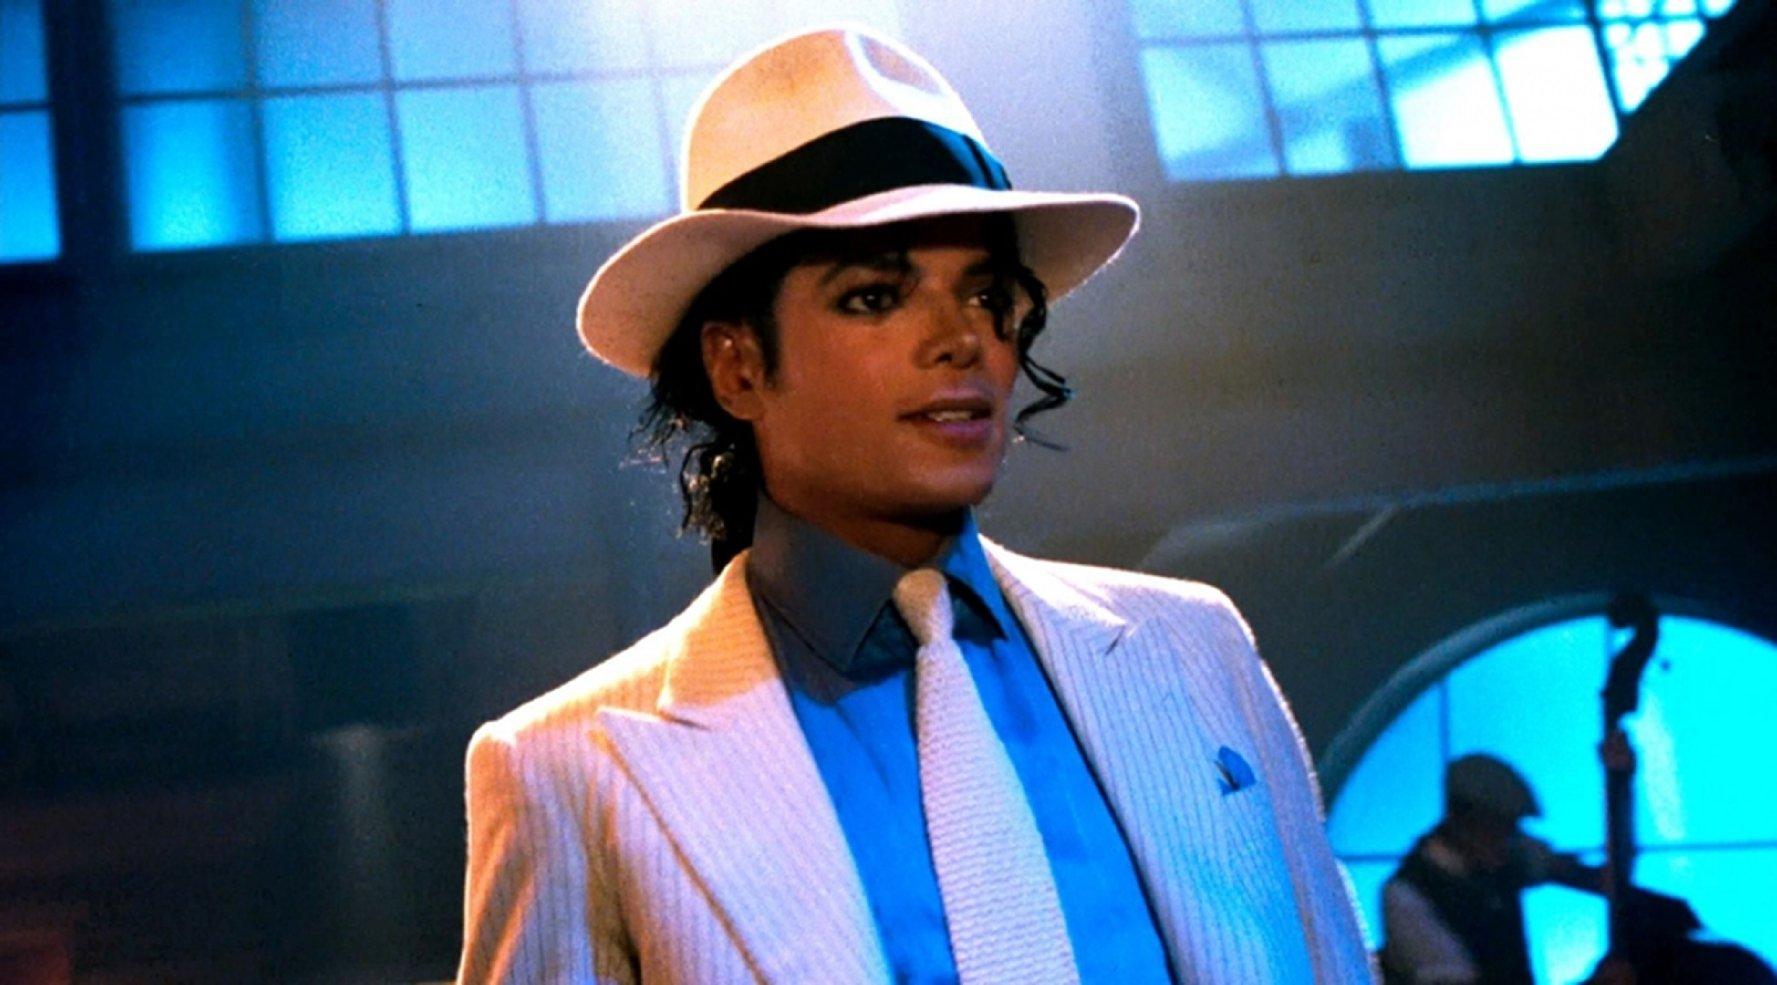 Michael Jackson Smooth Criminal Vortex Cultural